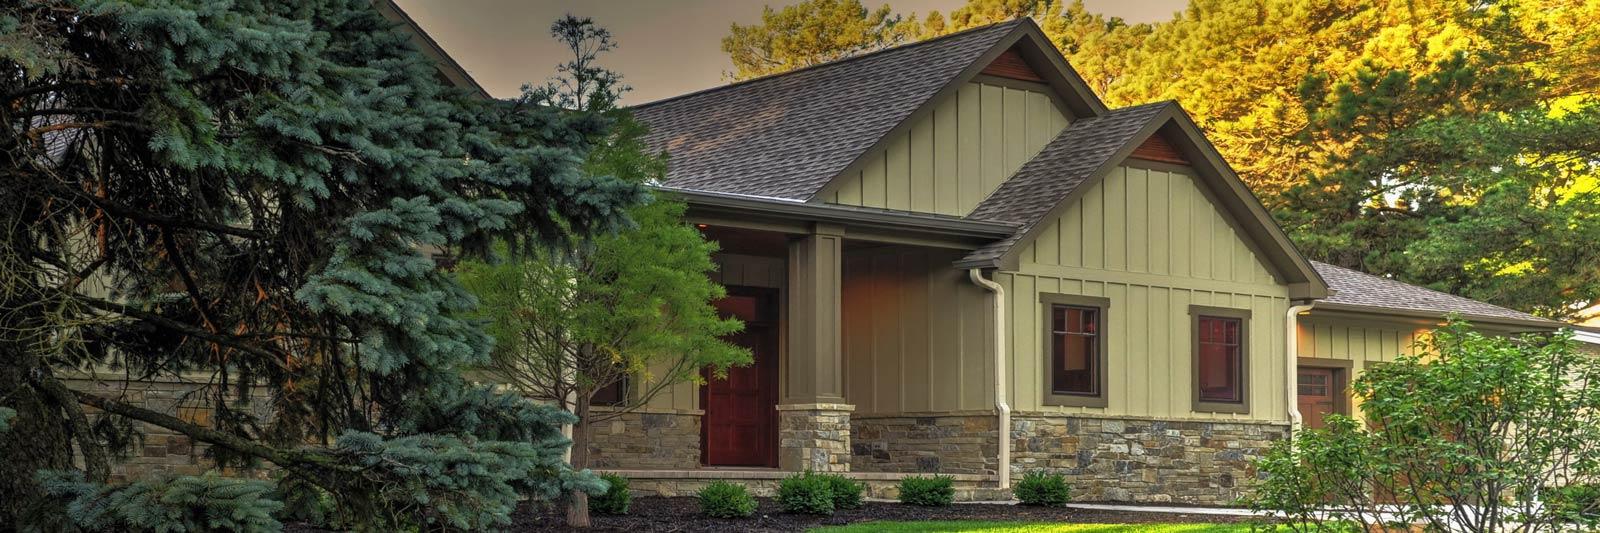 LA-Home-Builders-Lincoln-Nebraska-Exterior-House-With-Tree-1600x533.jpg